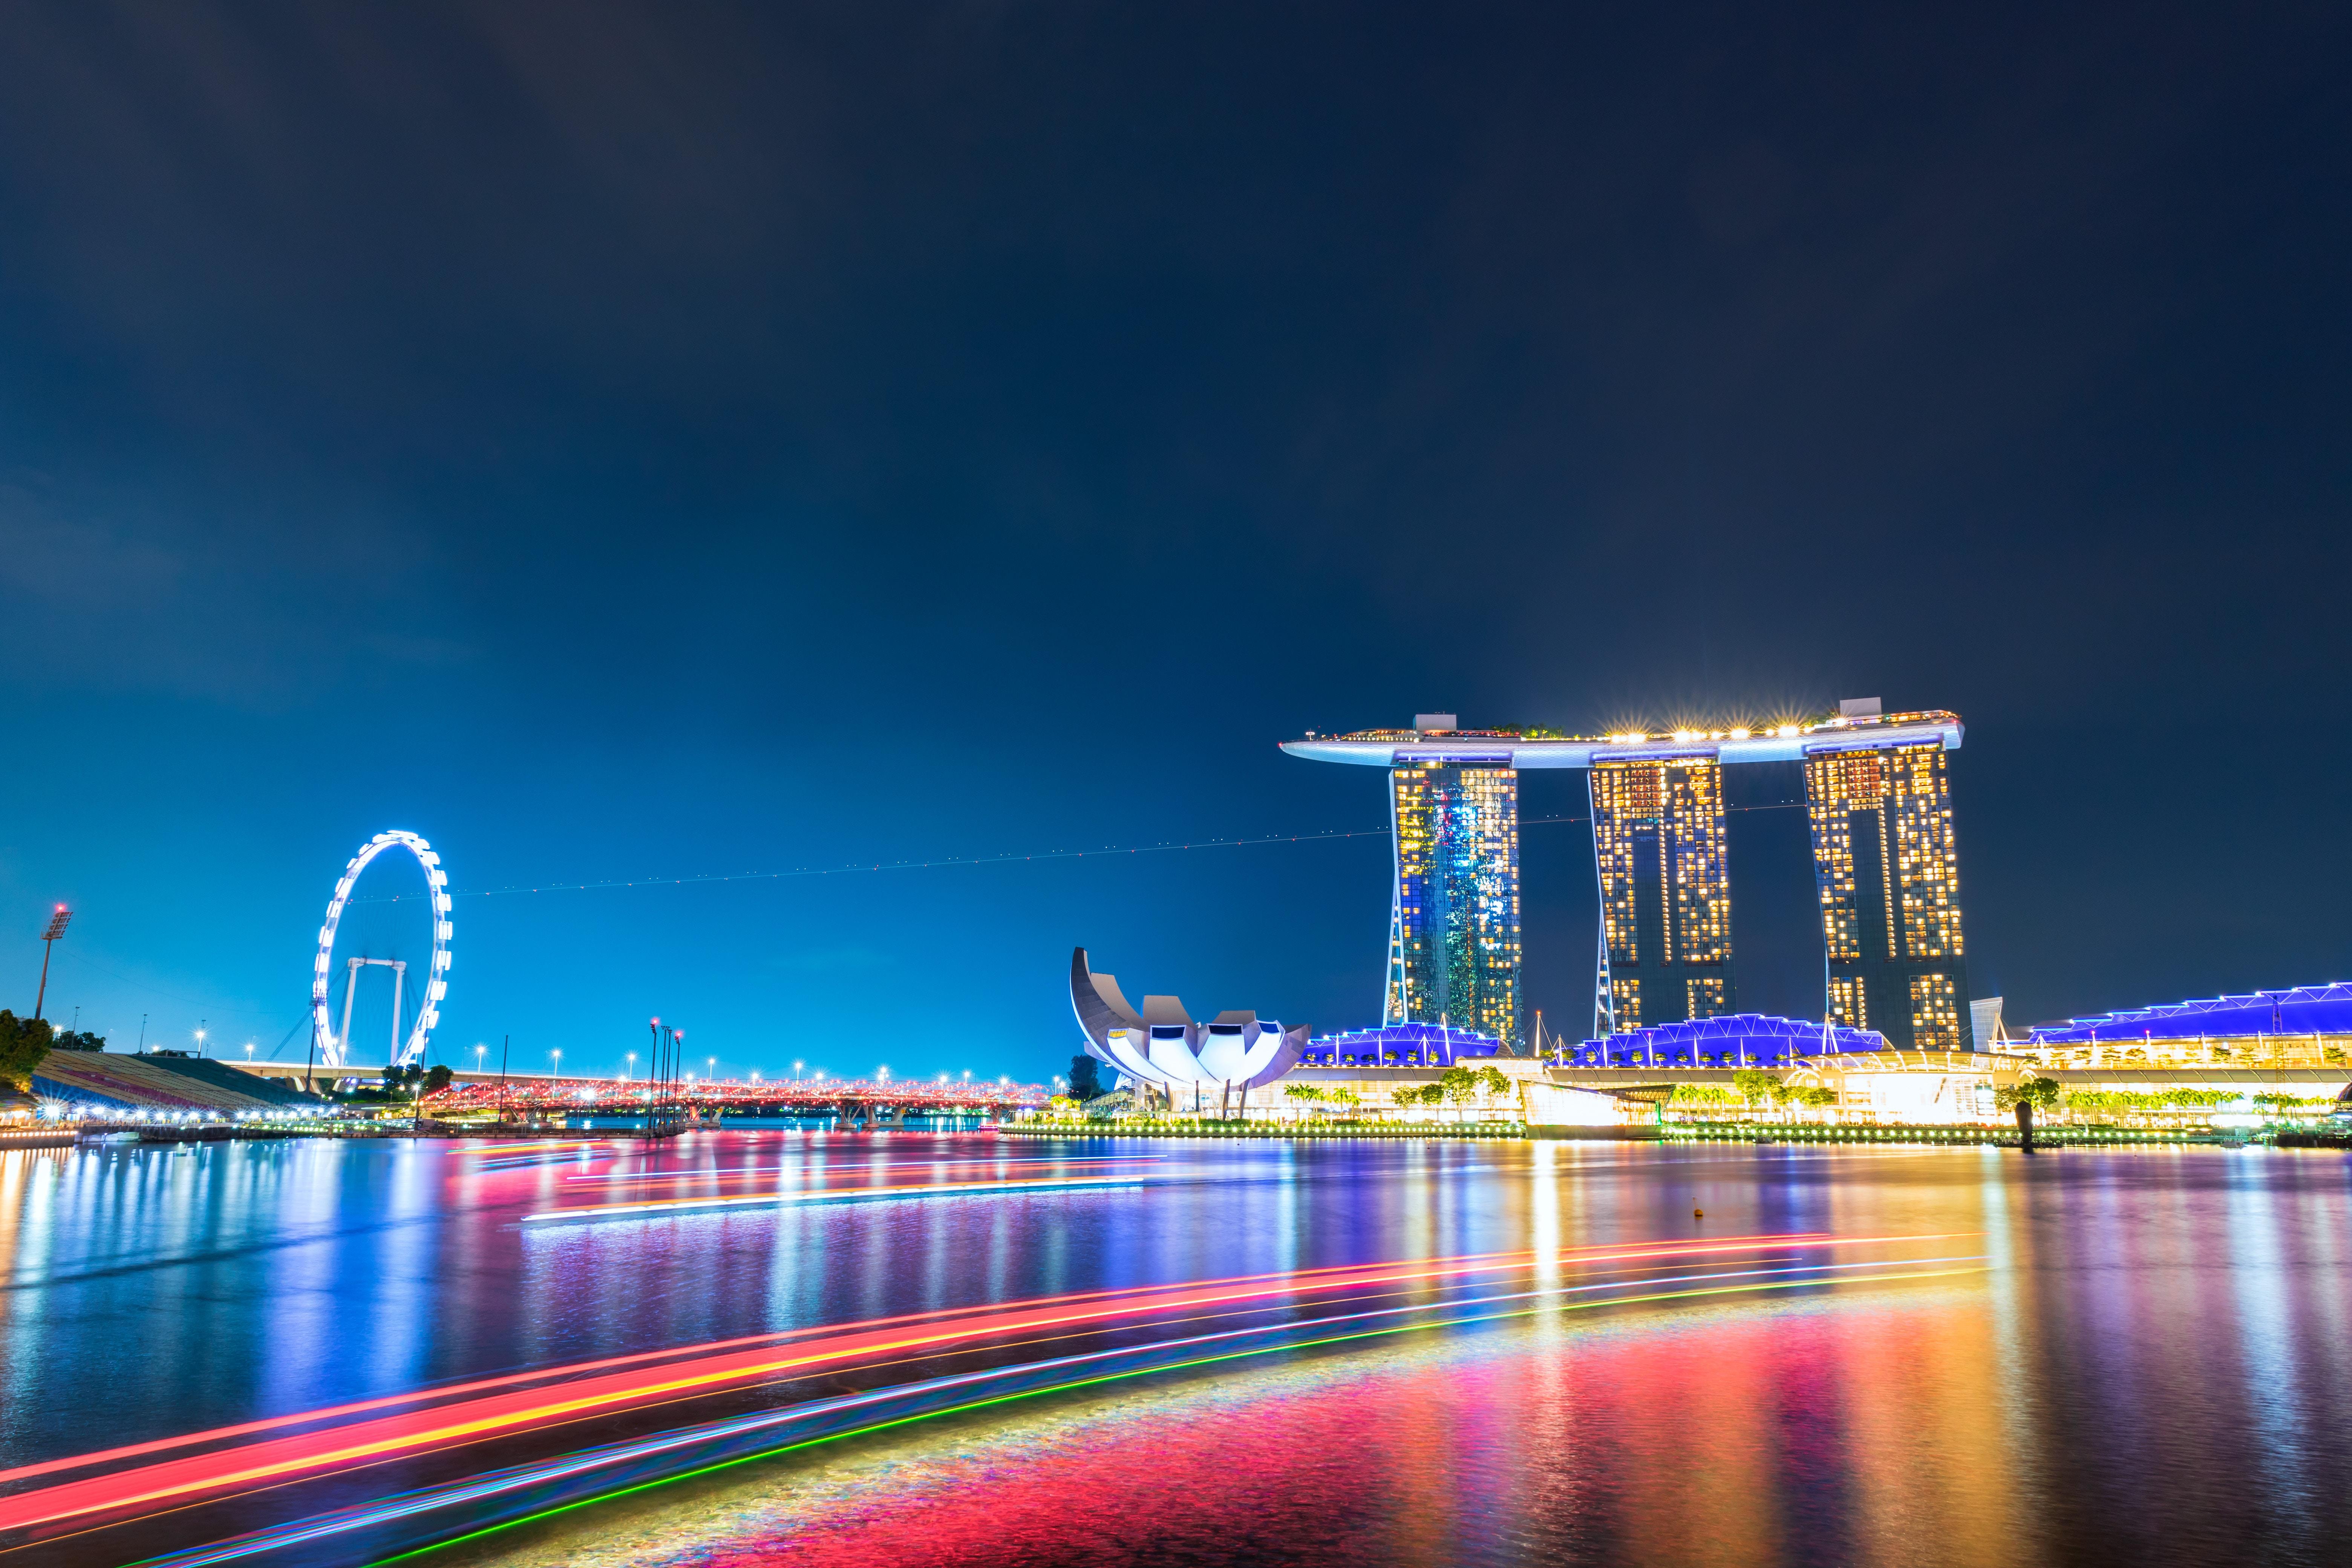 marina bay sands singapore 1574938306 - Marina Bay Sands Singapore -